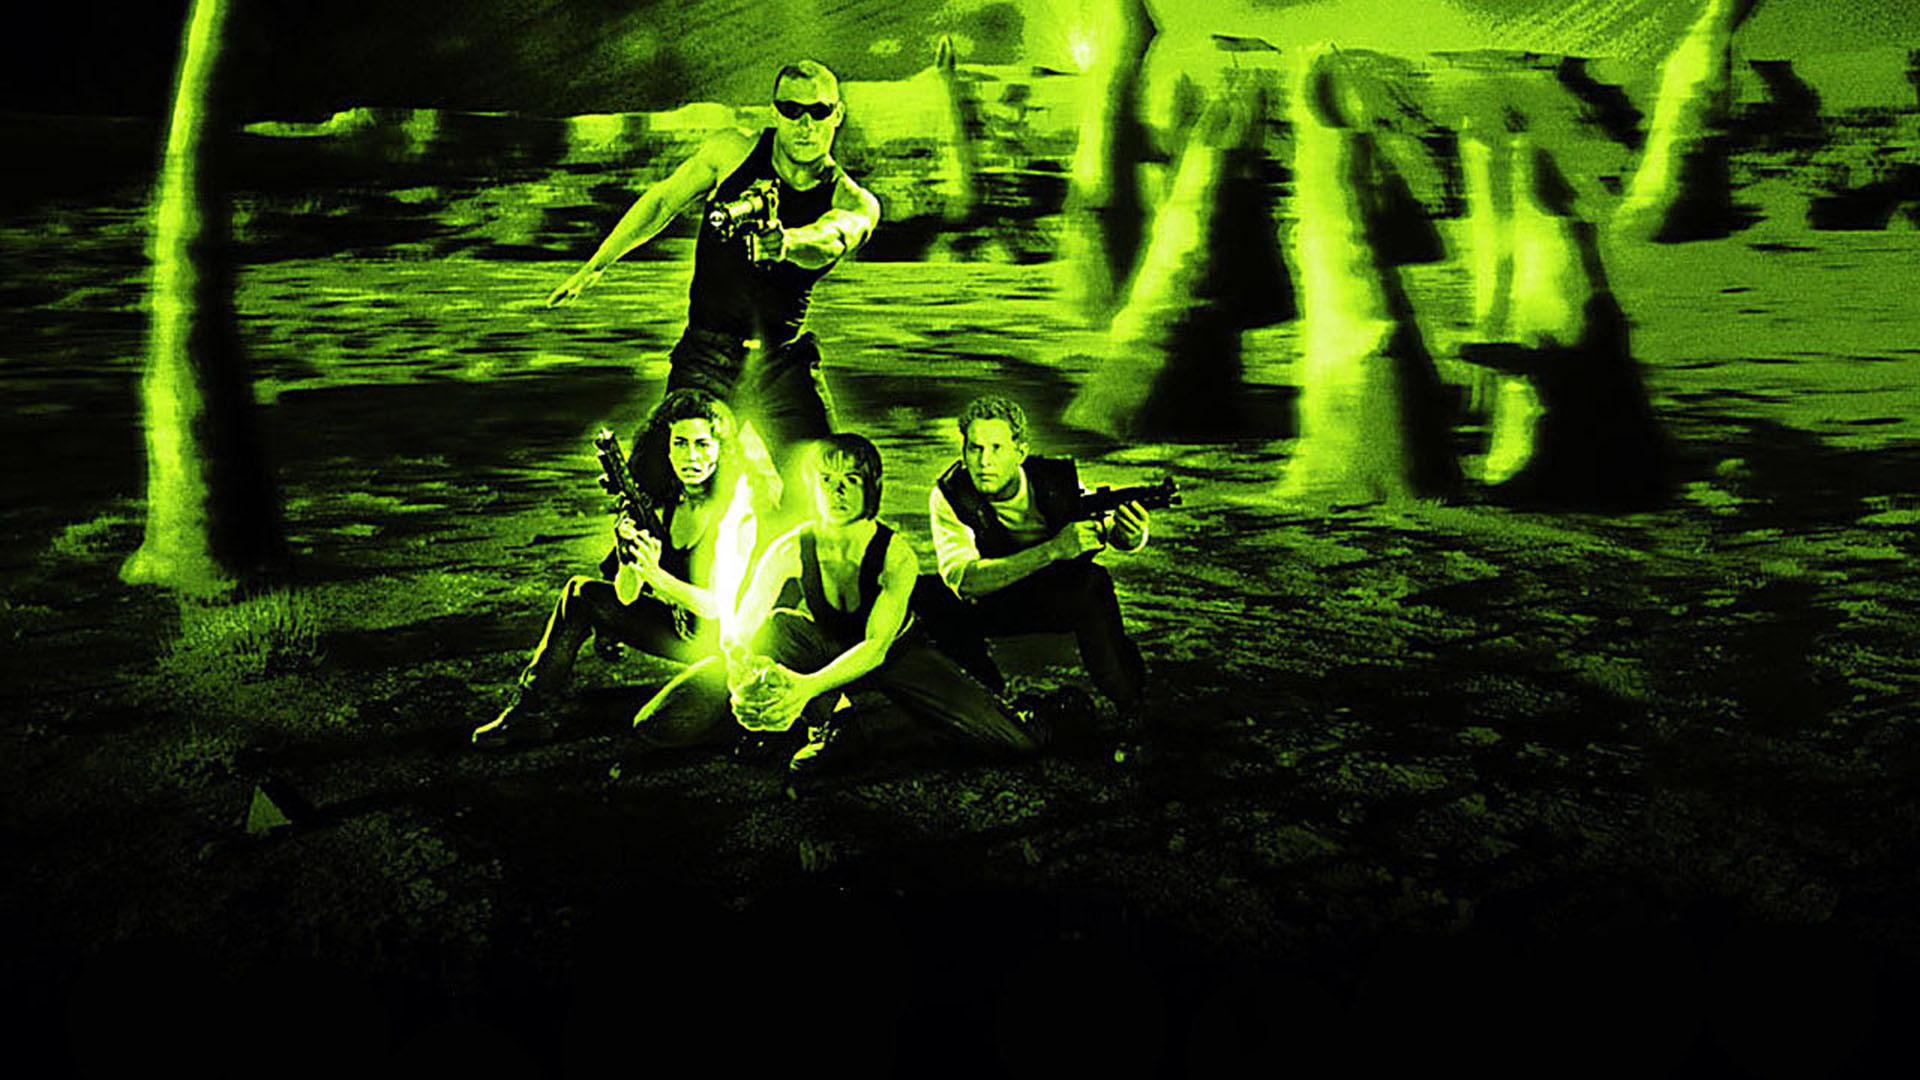 Eclipse Mortal riddick sci-fi warrior vin diesel gs ...